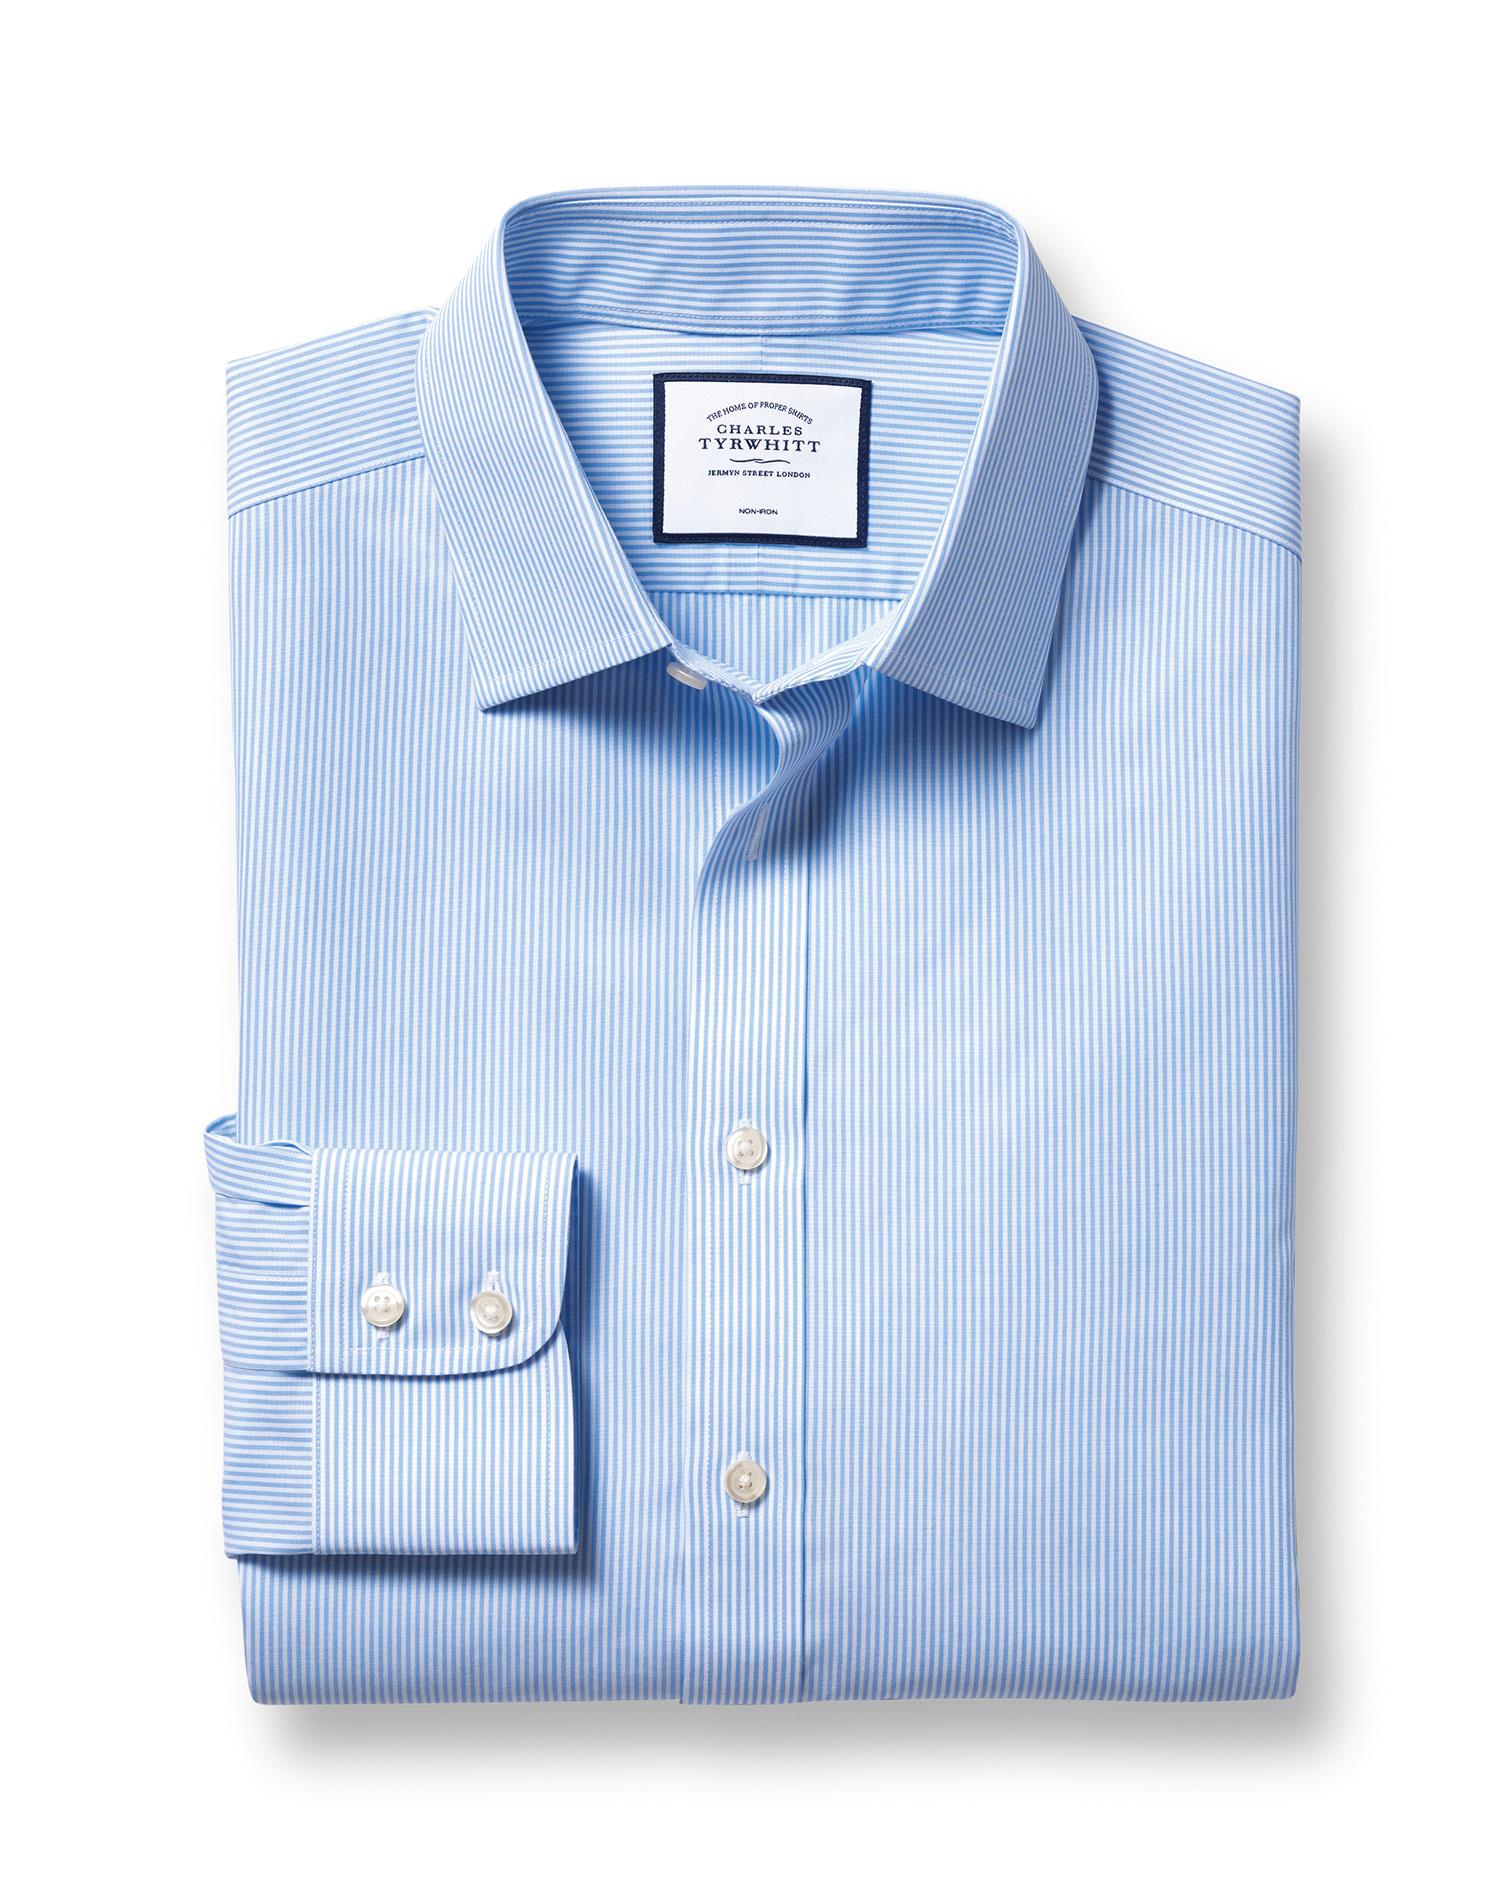 Slim Fit Non-Iron Sky Blue Bengal Stripe Cotton Formal Shirt by Charles Tyrwhitt